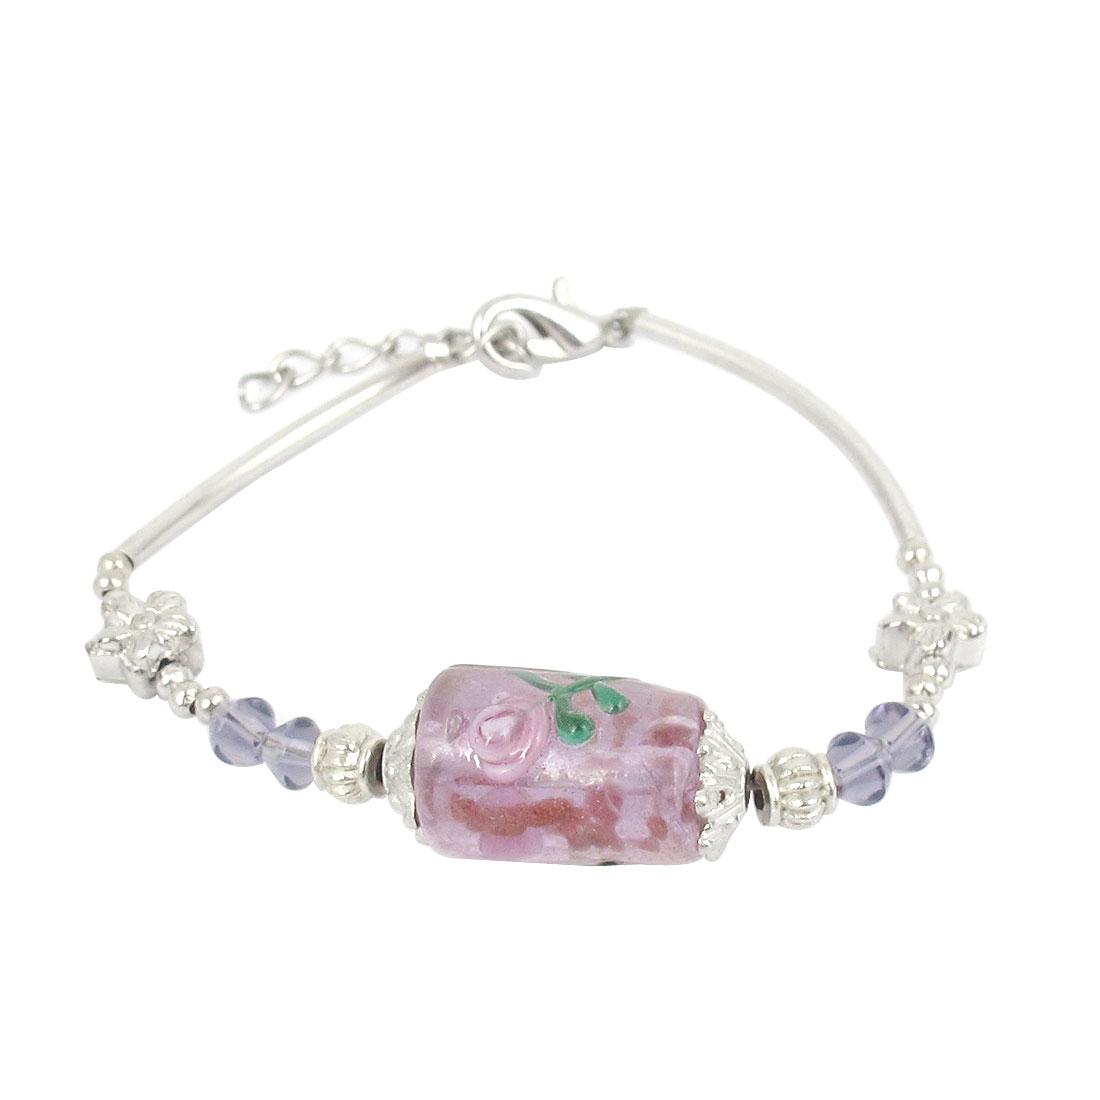 Lady Lobster Clasp Link Cylinder Bead Decor Wrist Ornament Bracelet Bangle Purple